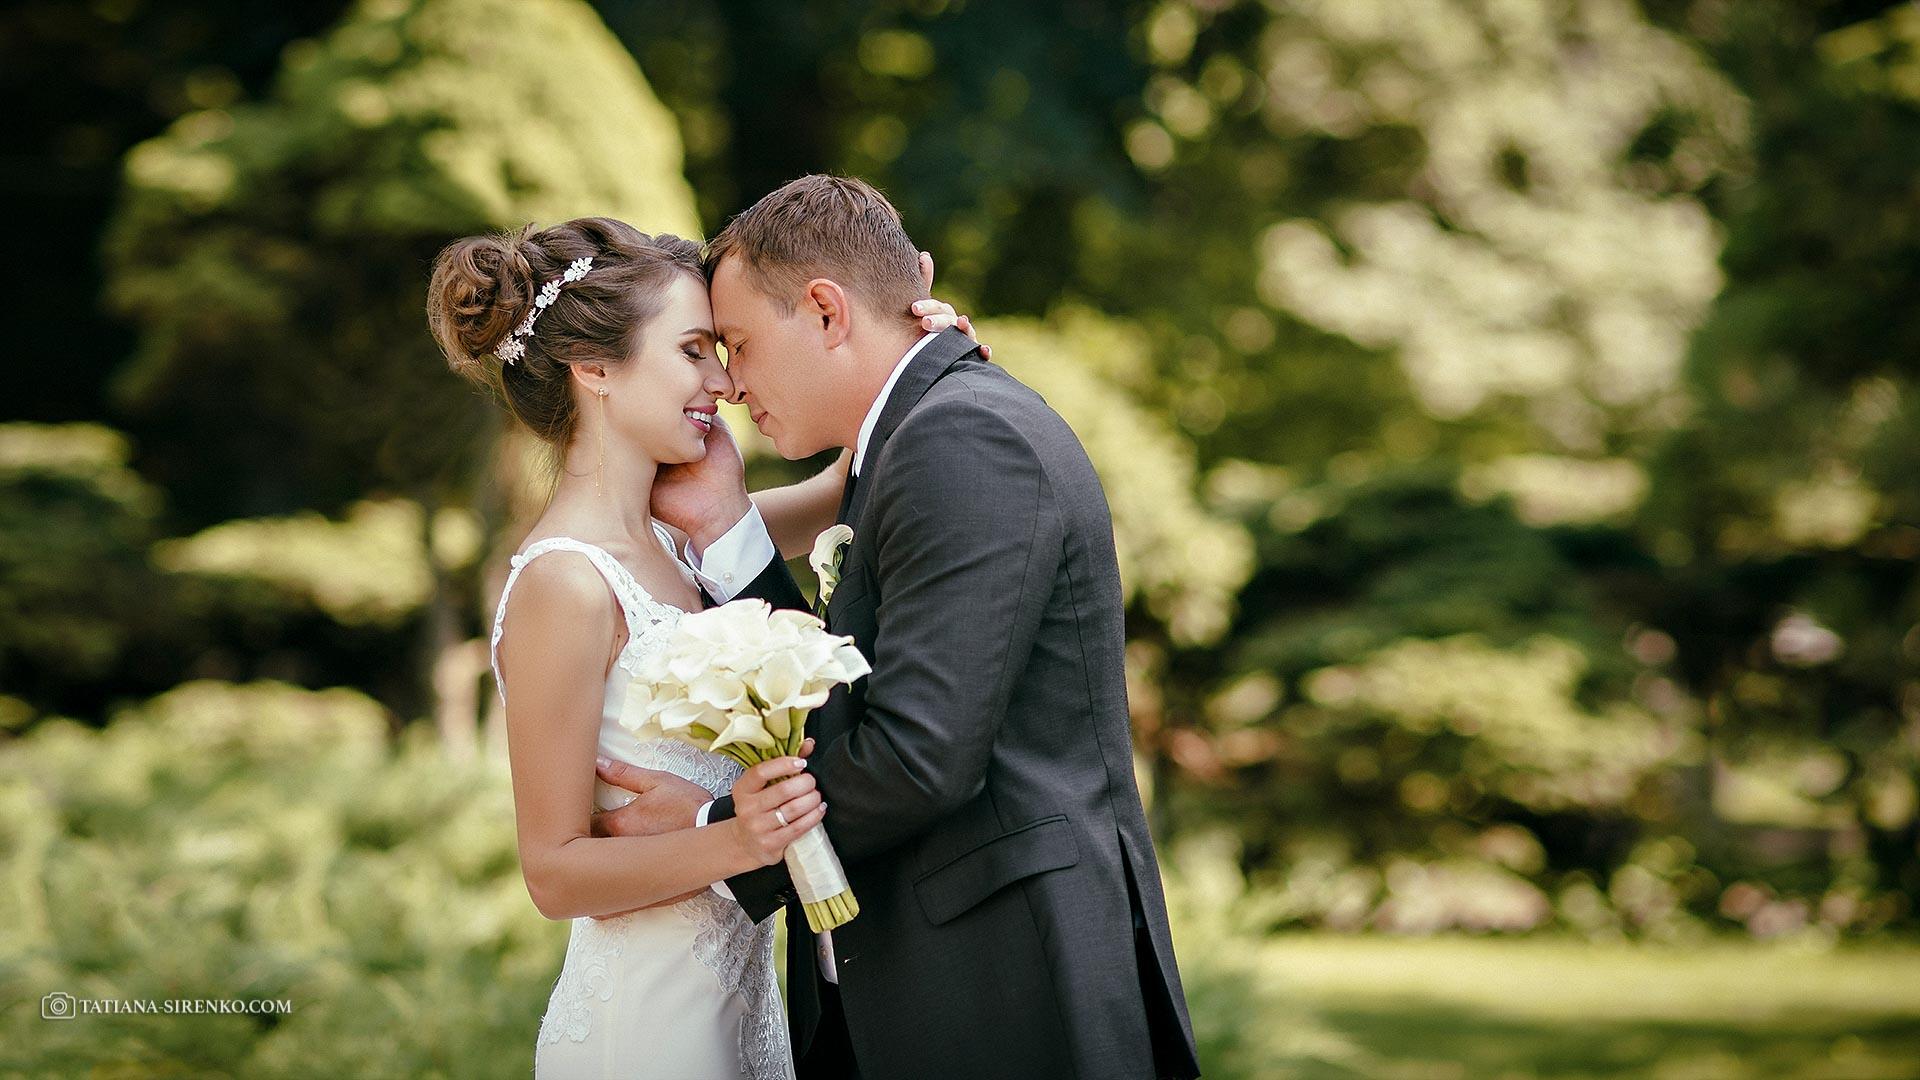 Свадебные фото Прага